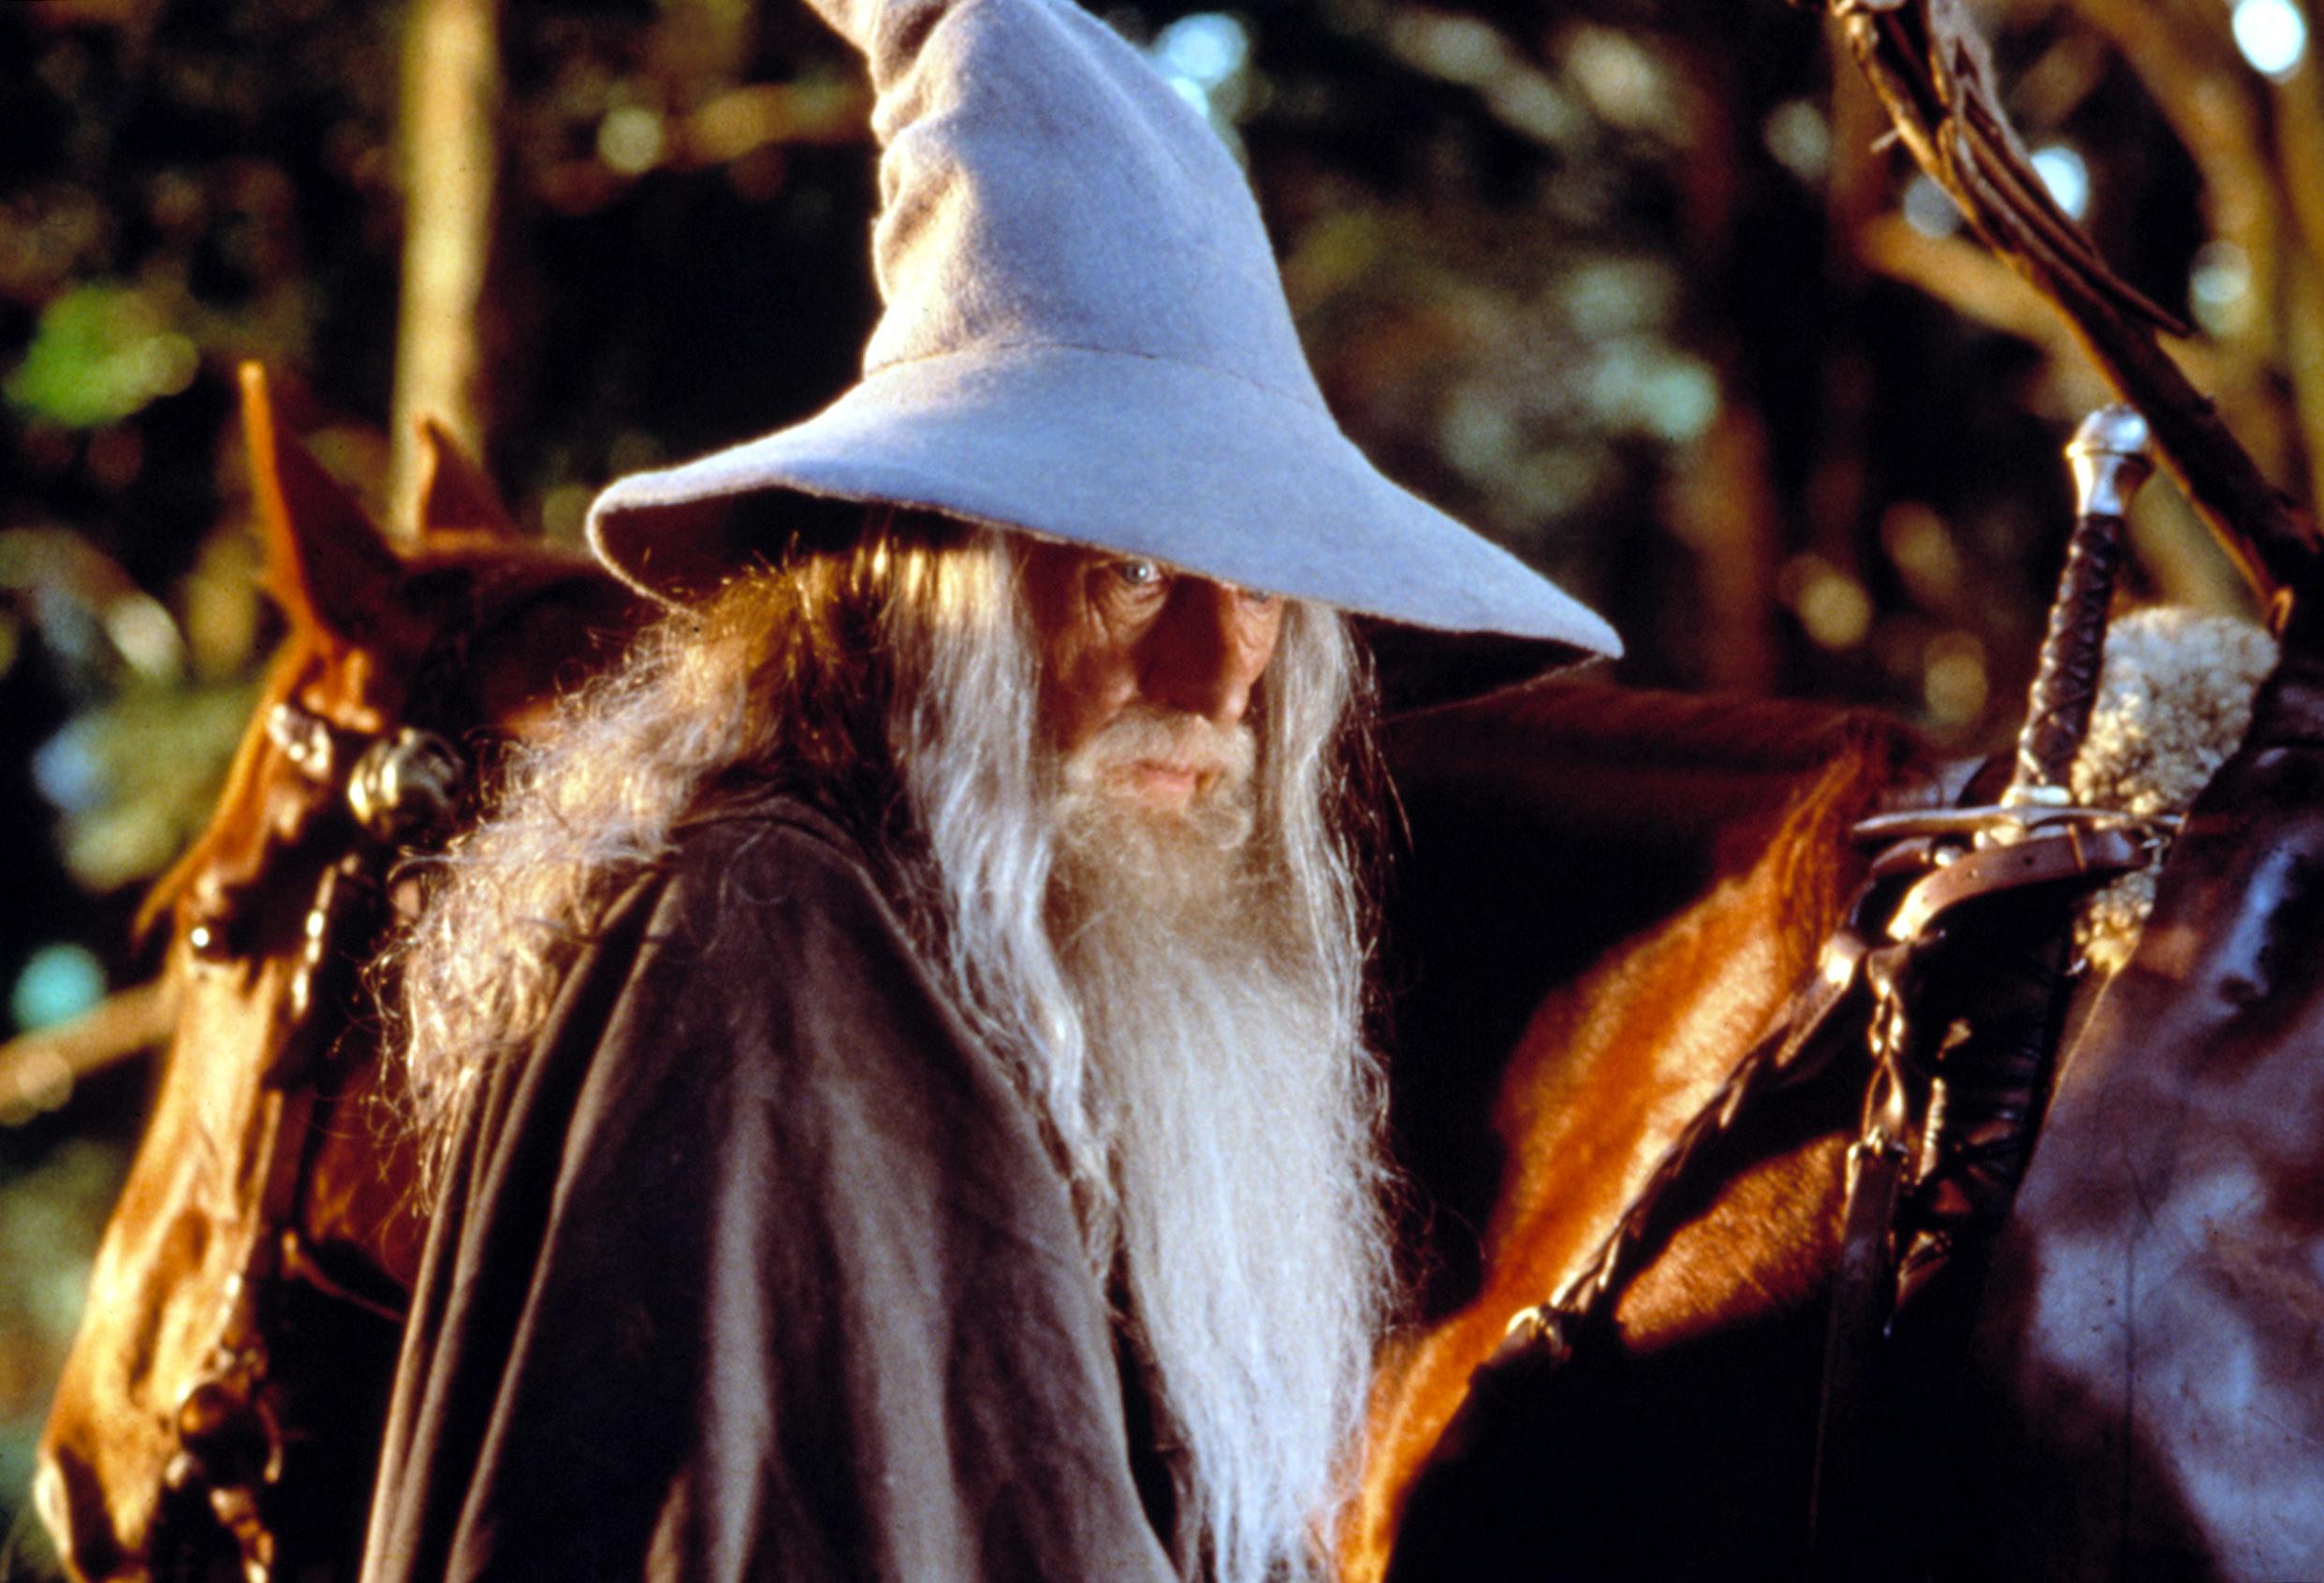 Ian McKellen as Gandalf